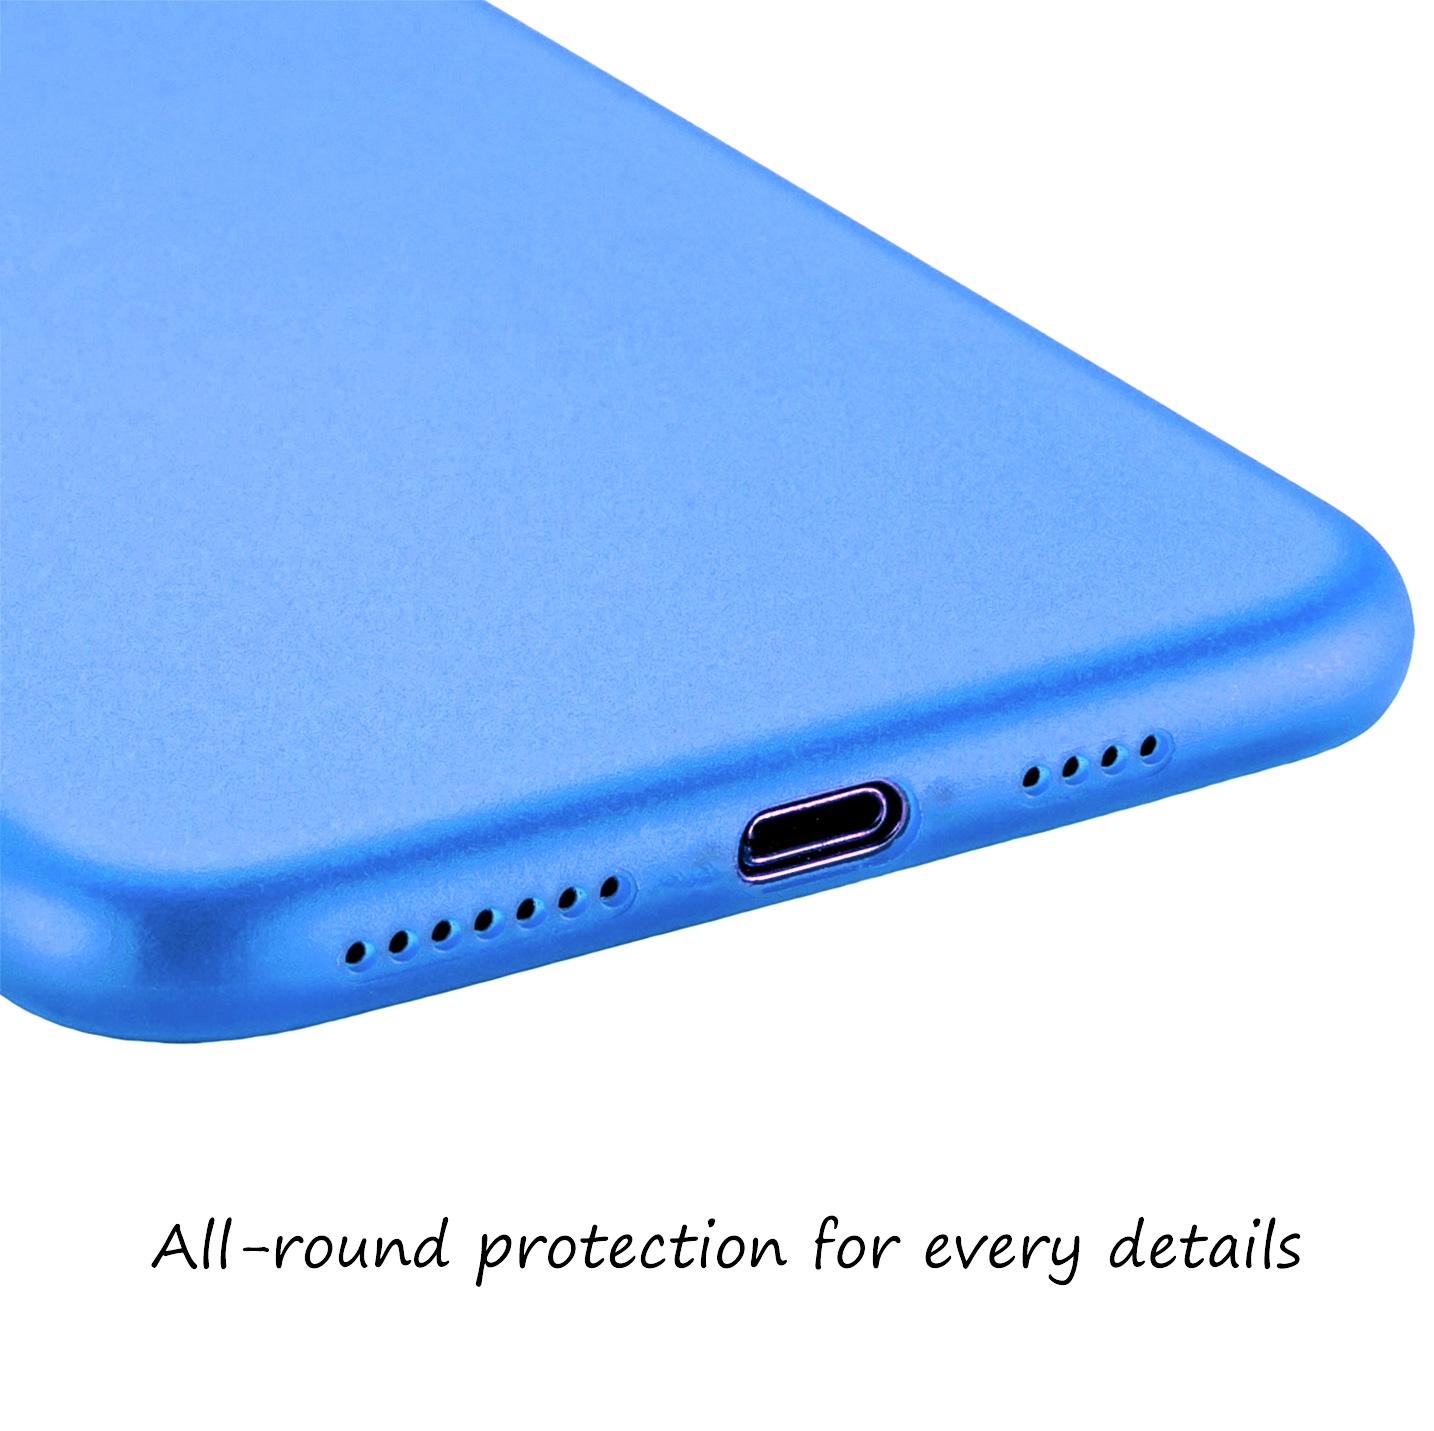 Ultra-Slim-Case-iPhone-11-Pro-5-8-034-Matt-Clear-Schutz-Huelle-Skin-Cover-Etui-Folie Indexbild 28